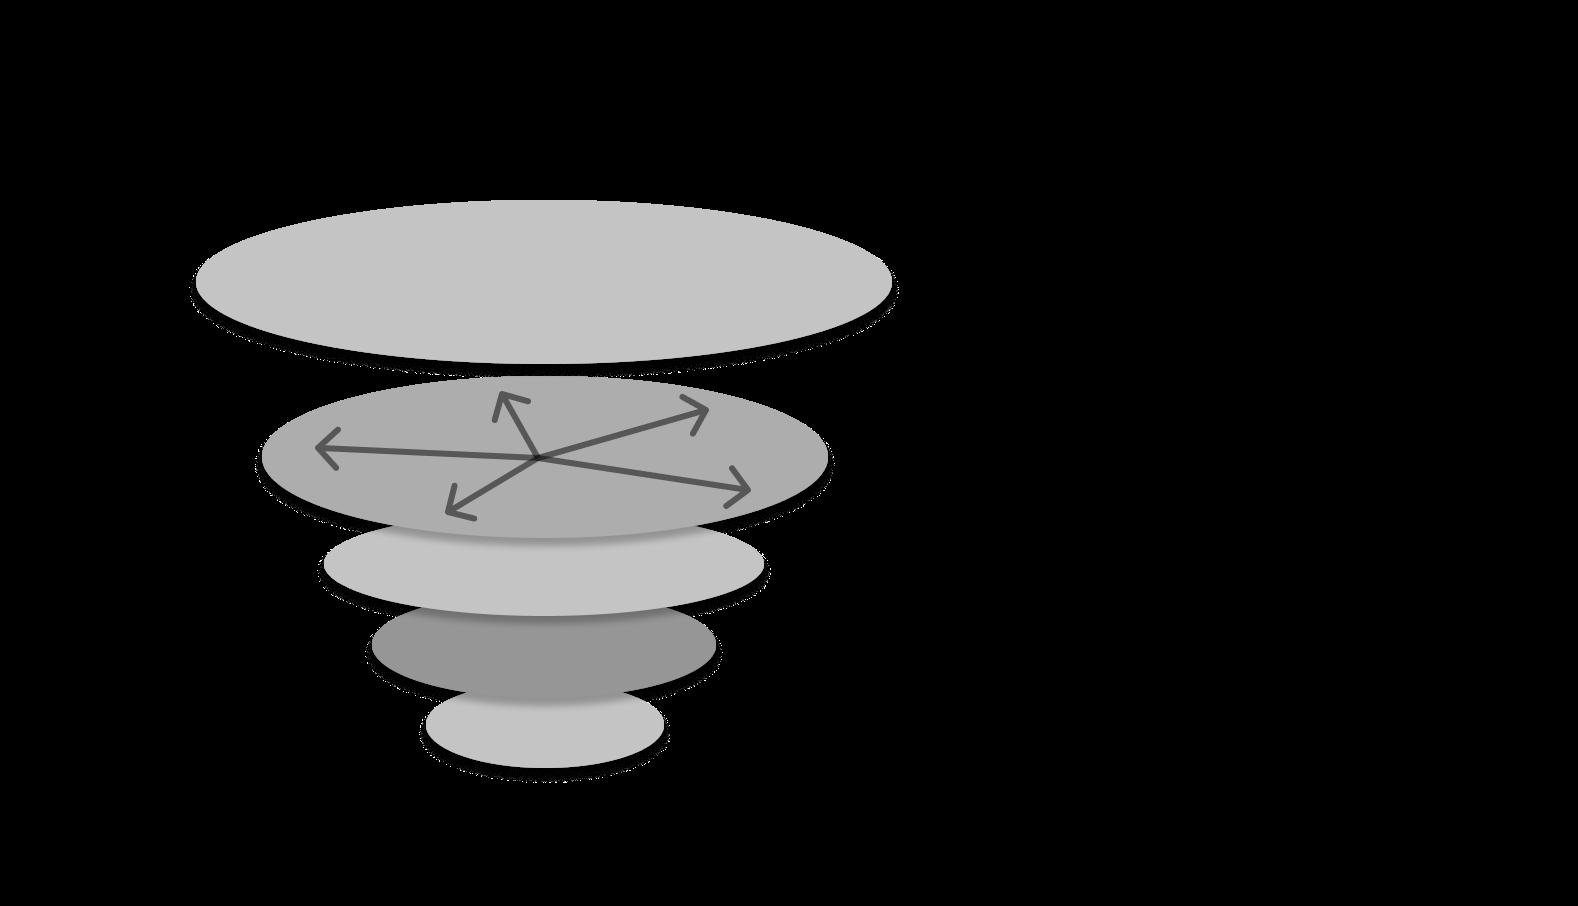 Vertical versus Horizontal Dev